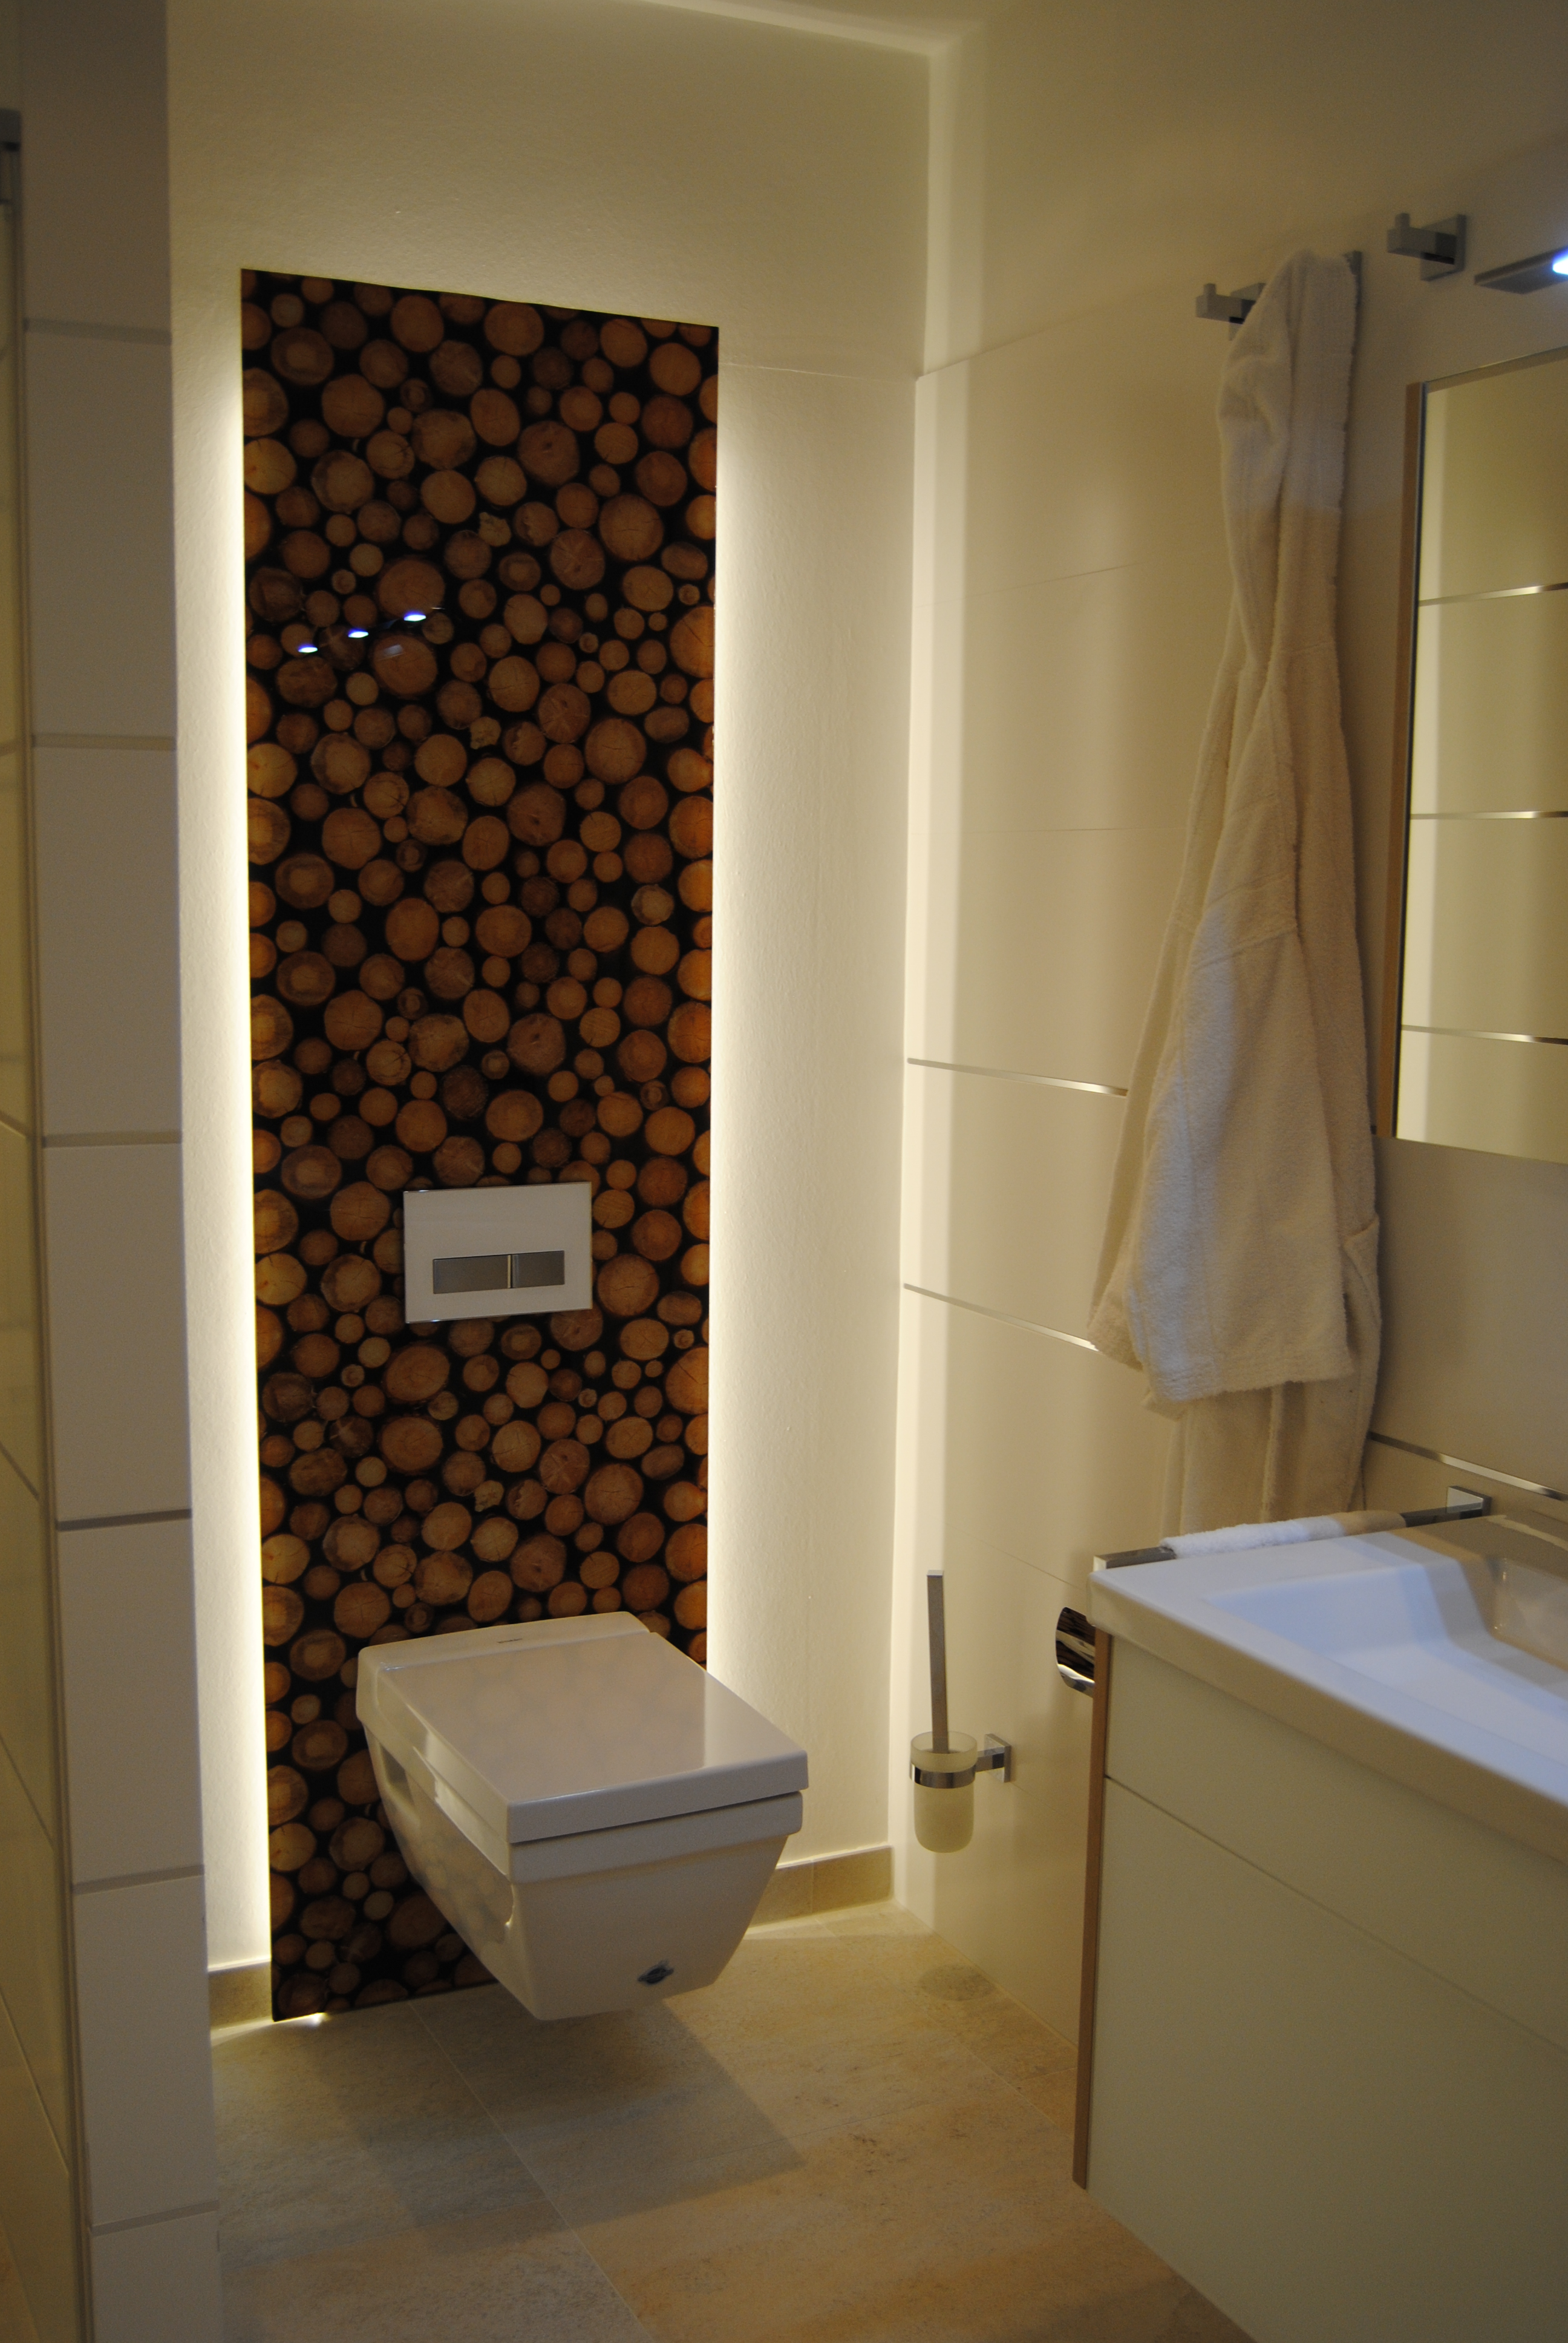 Luxusbad WC beleuchtet